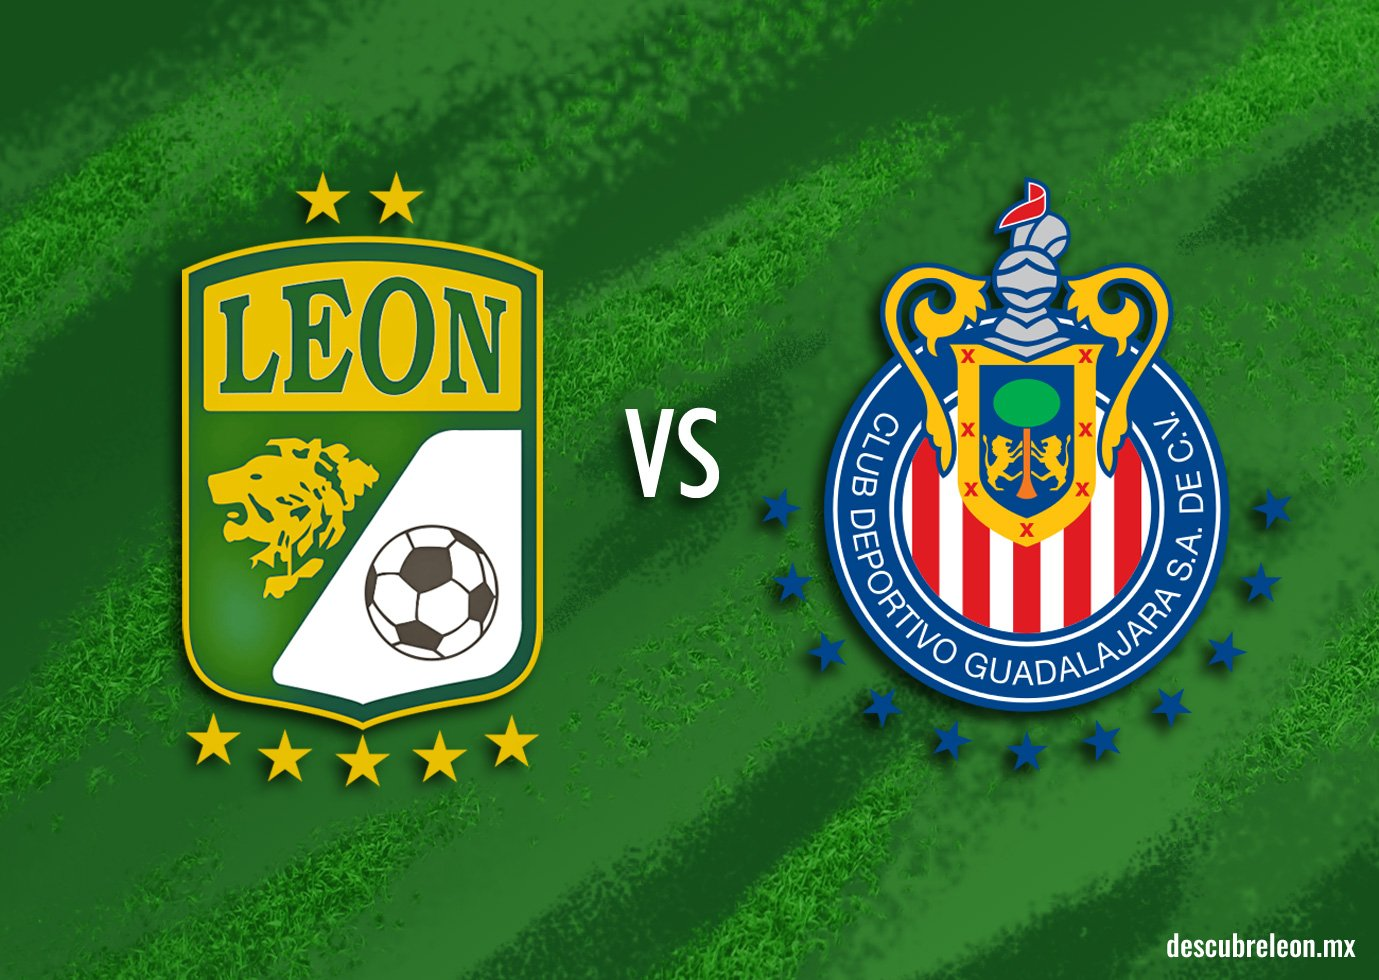 León vence 4-3 a las Chivas Jornada 5 Liga MX Apertura 2019